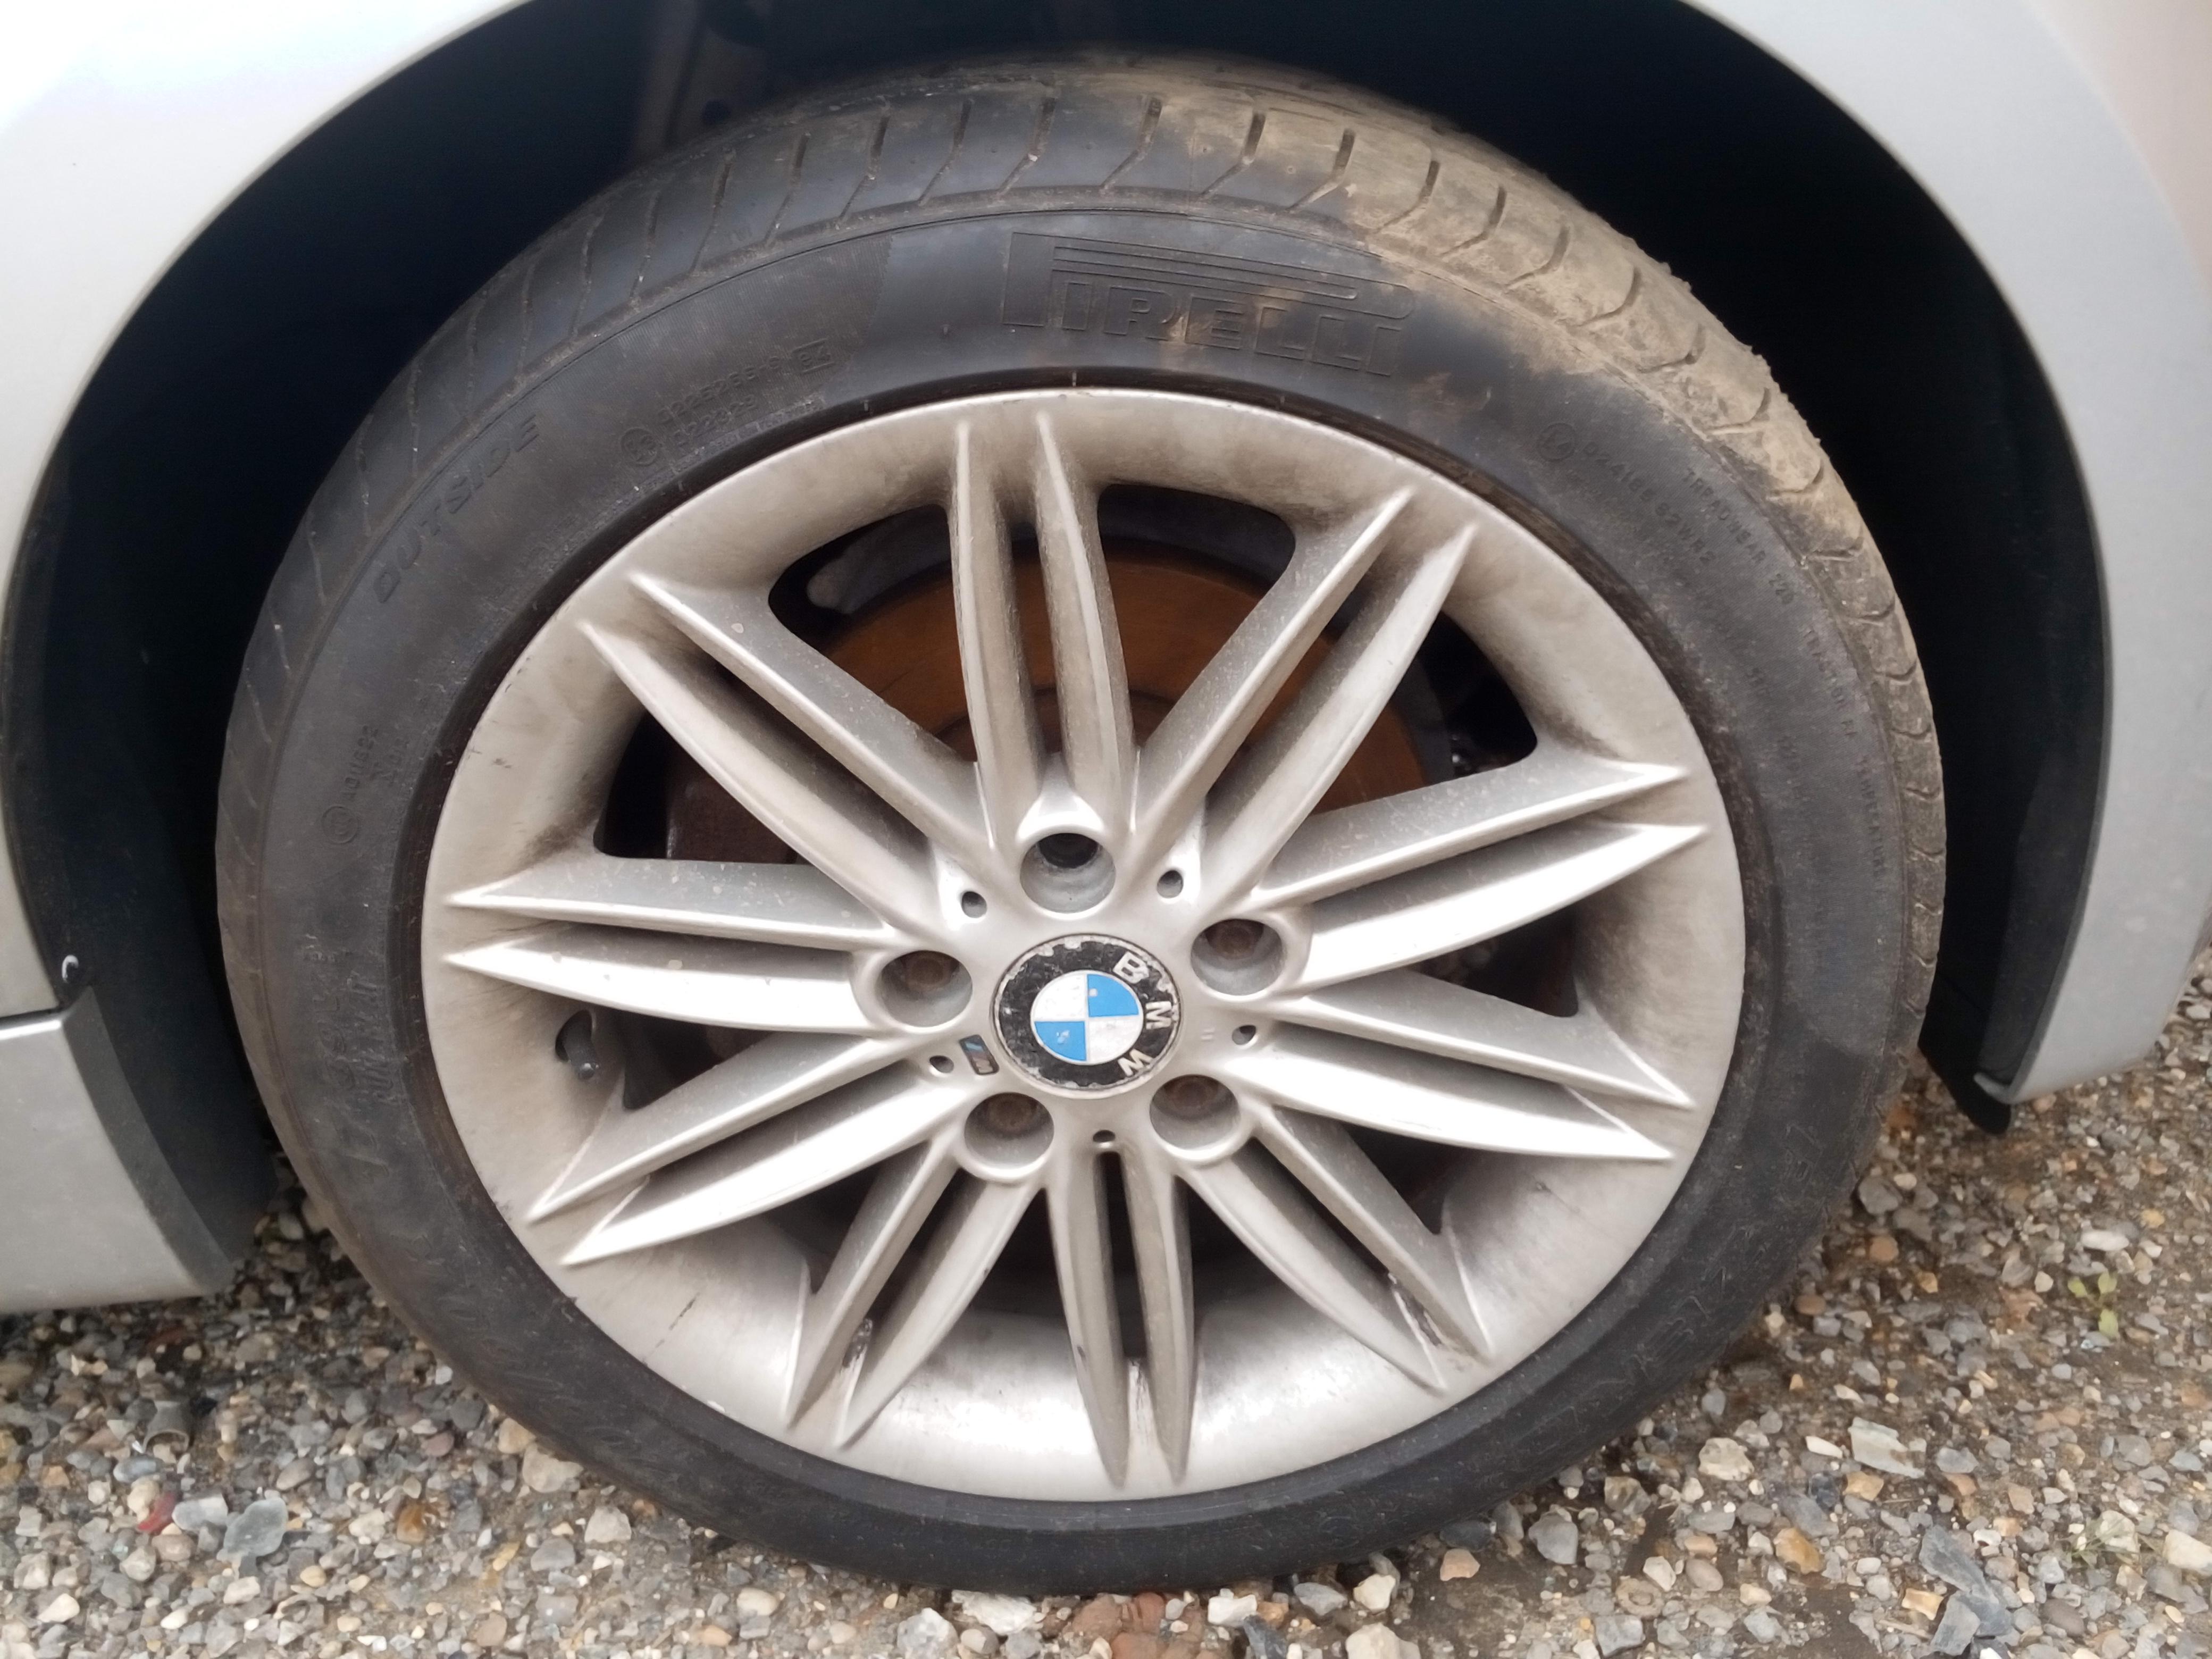 Need A Car Sudbury >> BMW 1 SERIES E81 E82 E87 M SPORT ALLOY WHEEL WITH 6MM TYRE ...